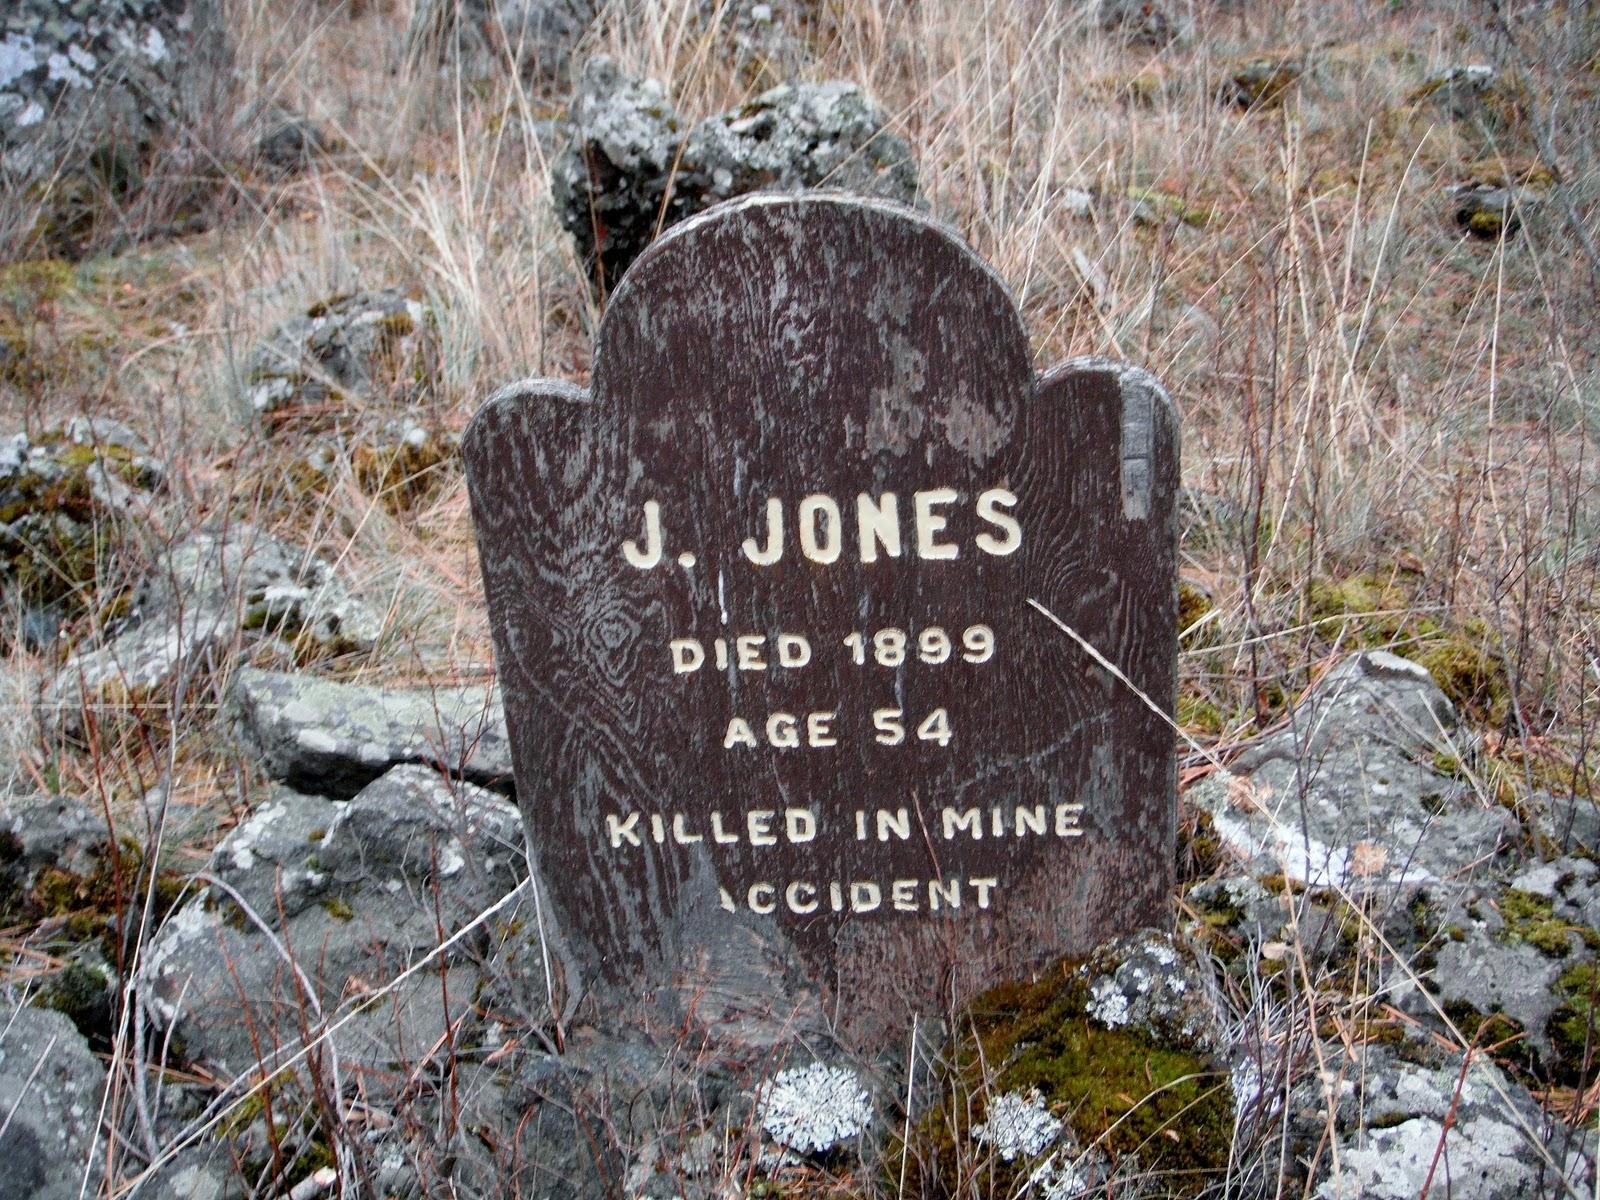 Jim jones cult kool aid